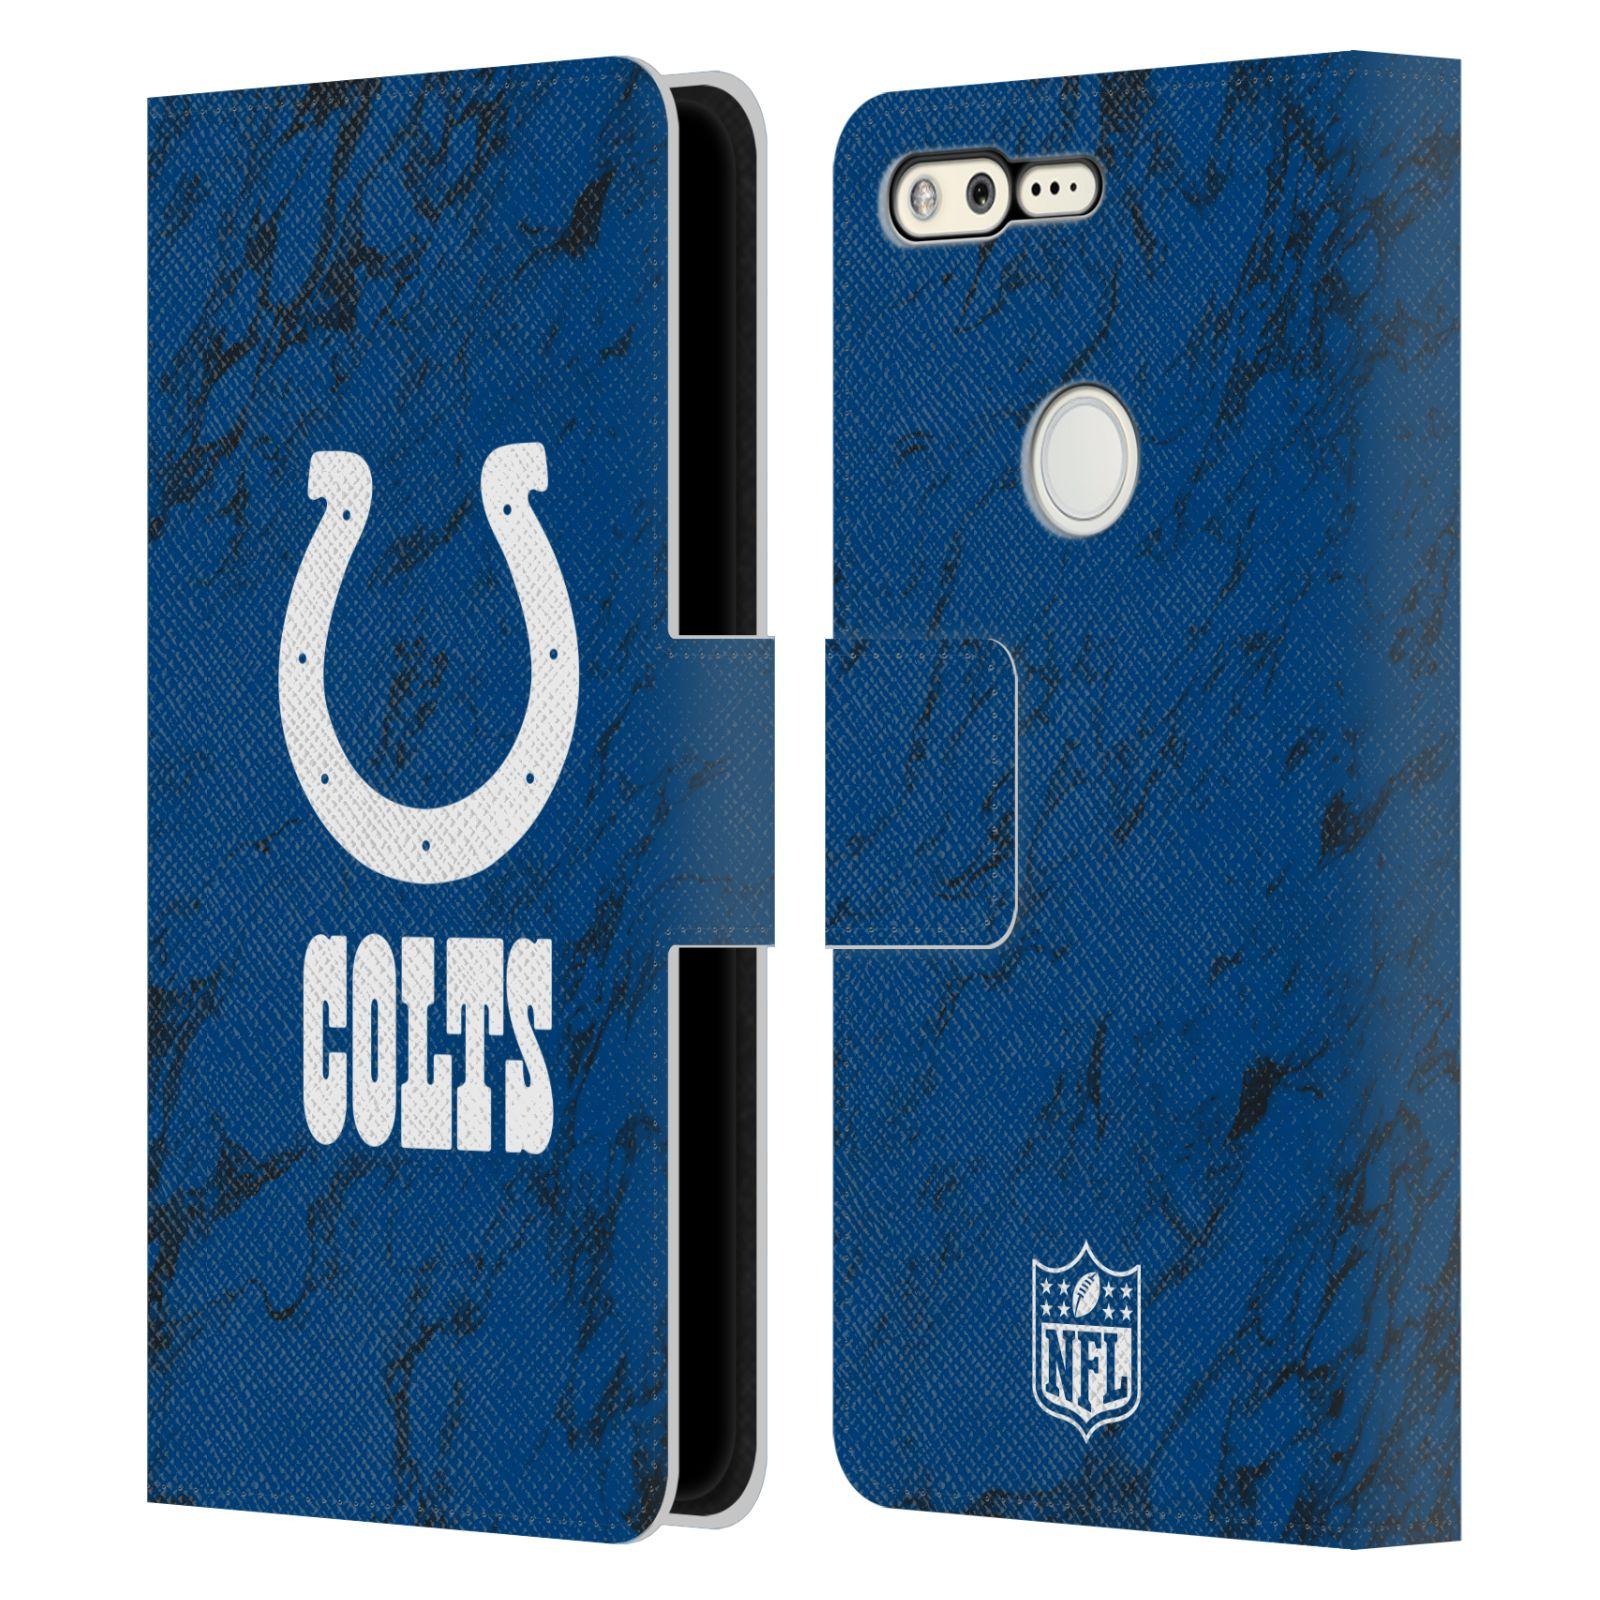 Pixel 3a 4a 選択 5G オフィシャル 商い NFL Graphics Google Colts Indianapolis レザー手帳型ウォレットタイプケース 電話